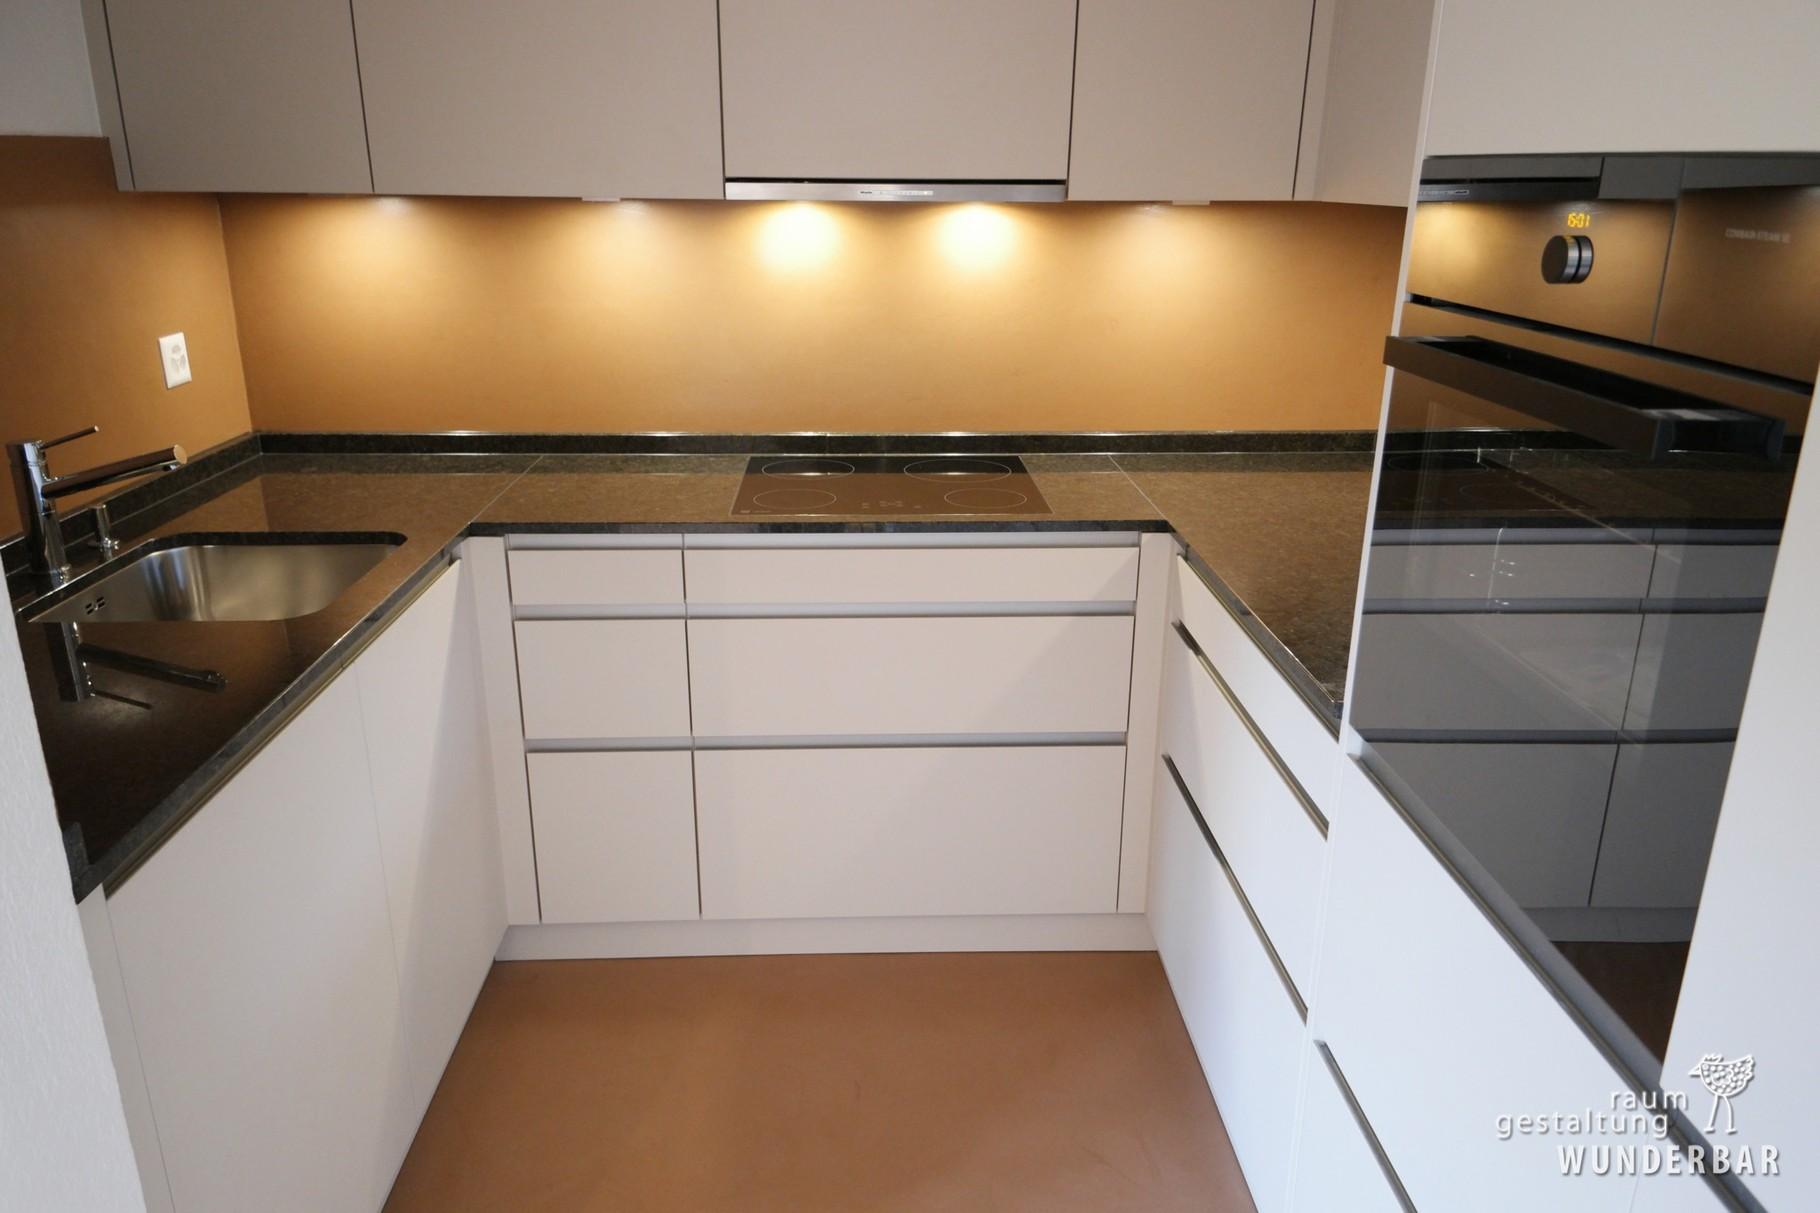 Nachher: Moderne Küche mit fugenloser Wand/Boden-Beschichtung